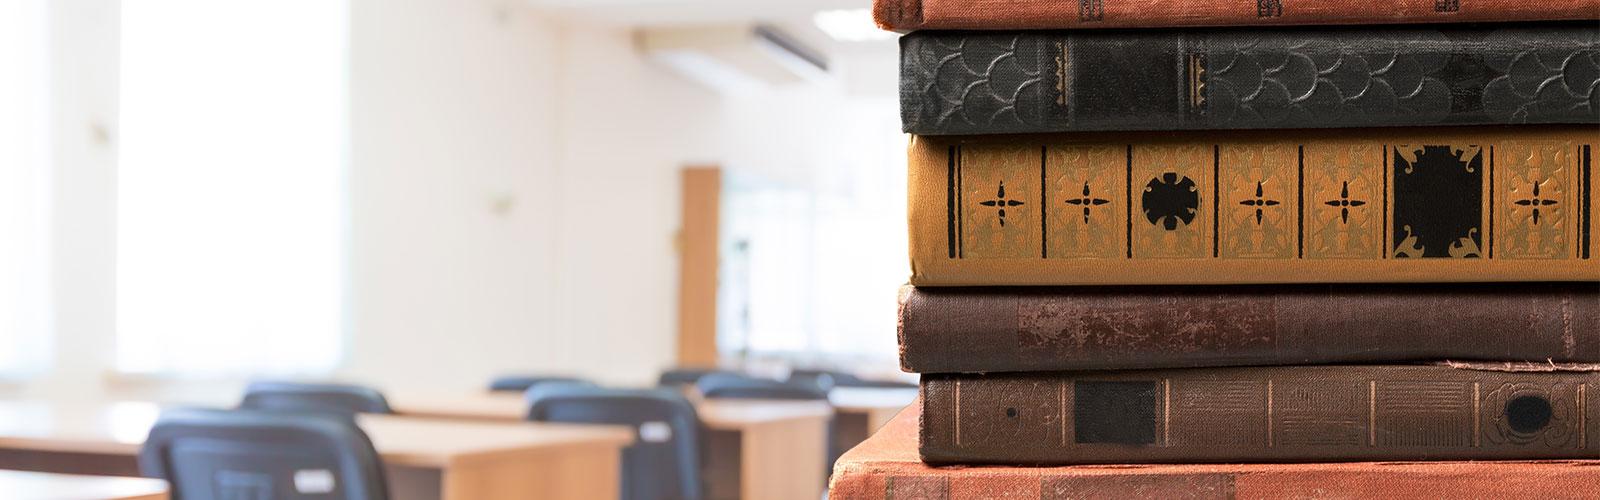 Books_bg1